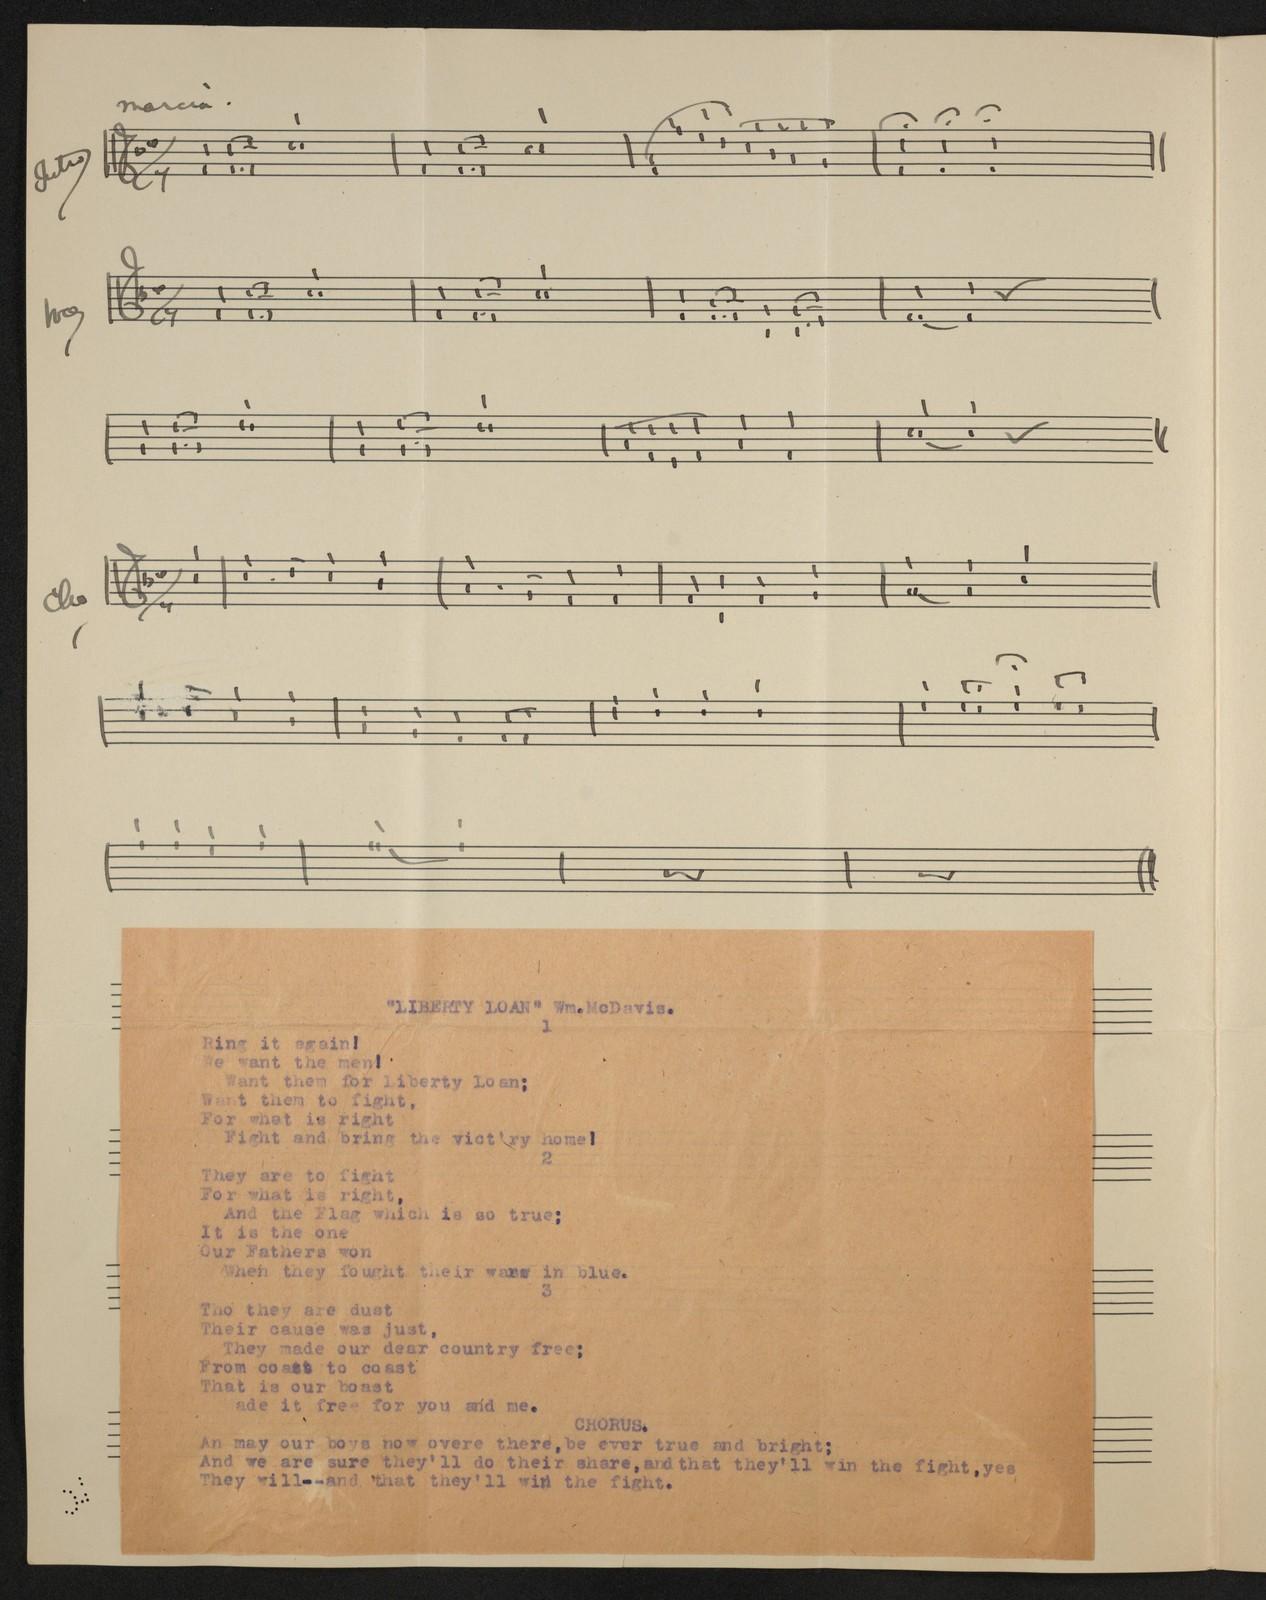 Liberty loan song